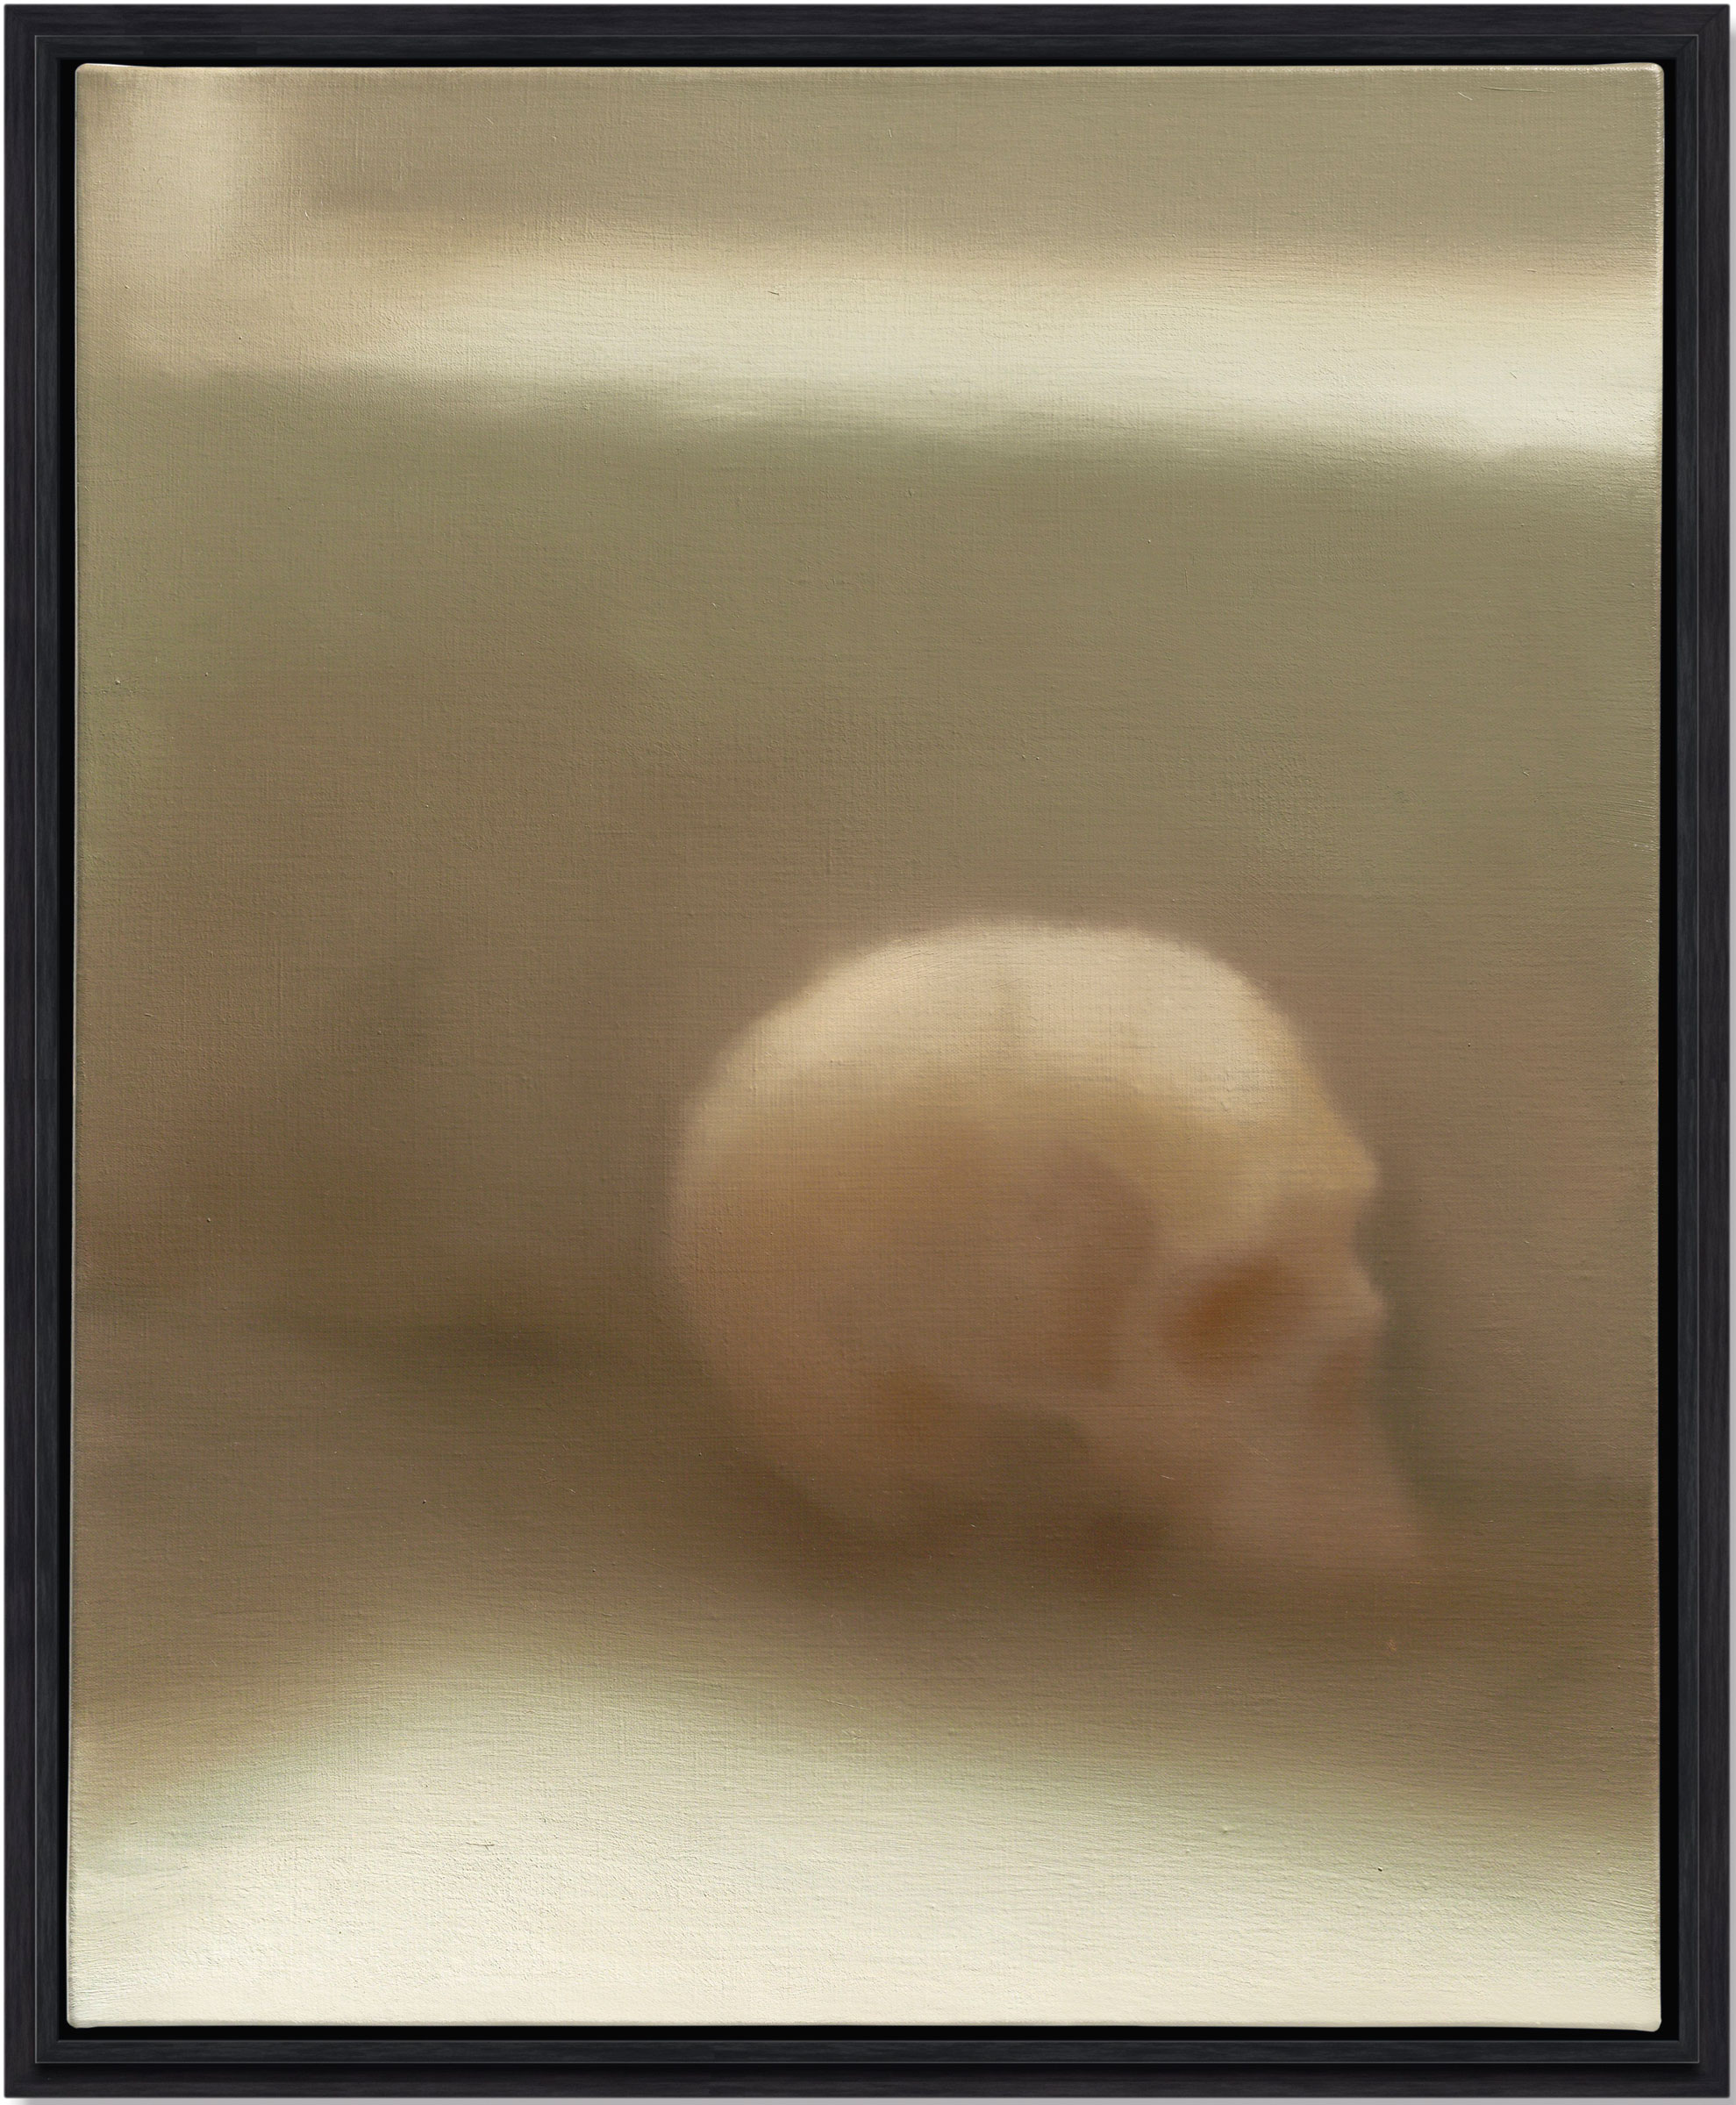 Gerhard Richter-Schadel -Poster Skull